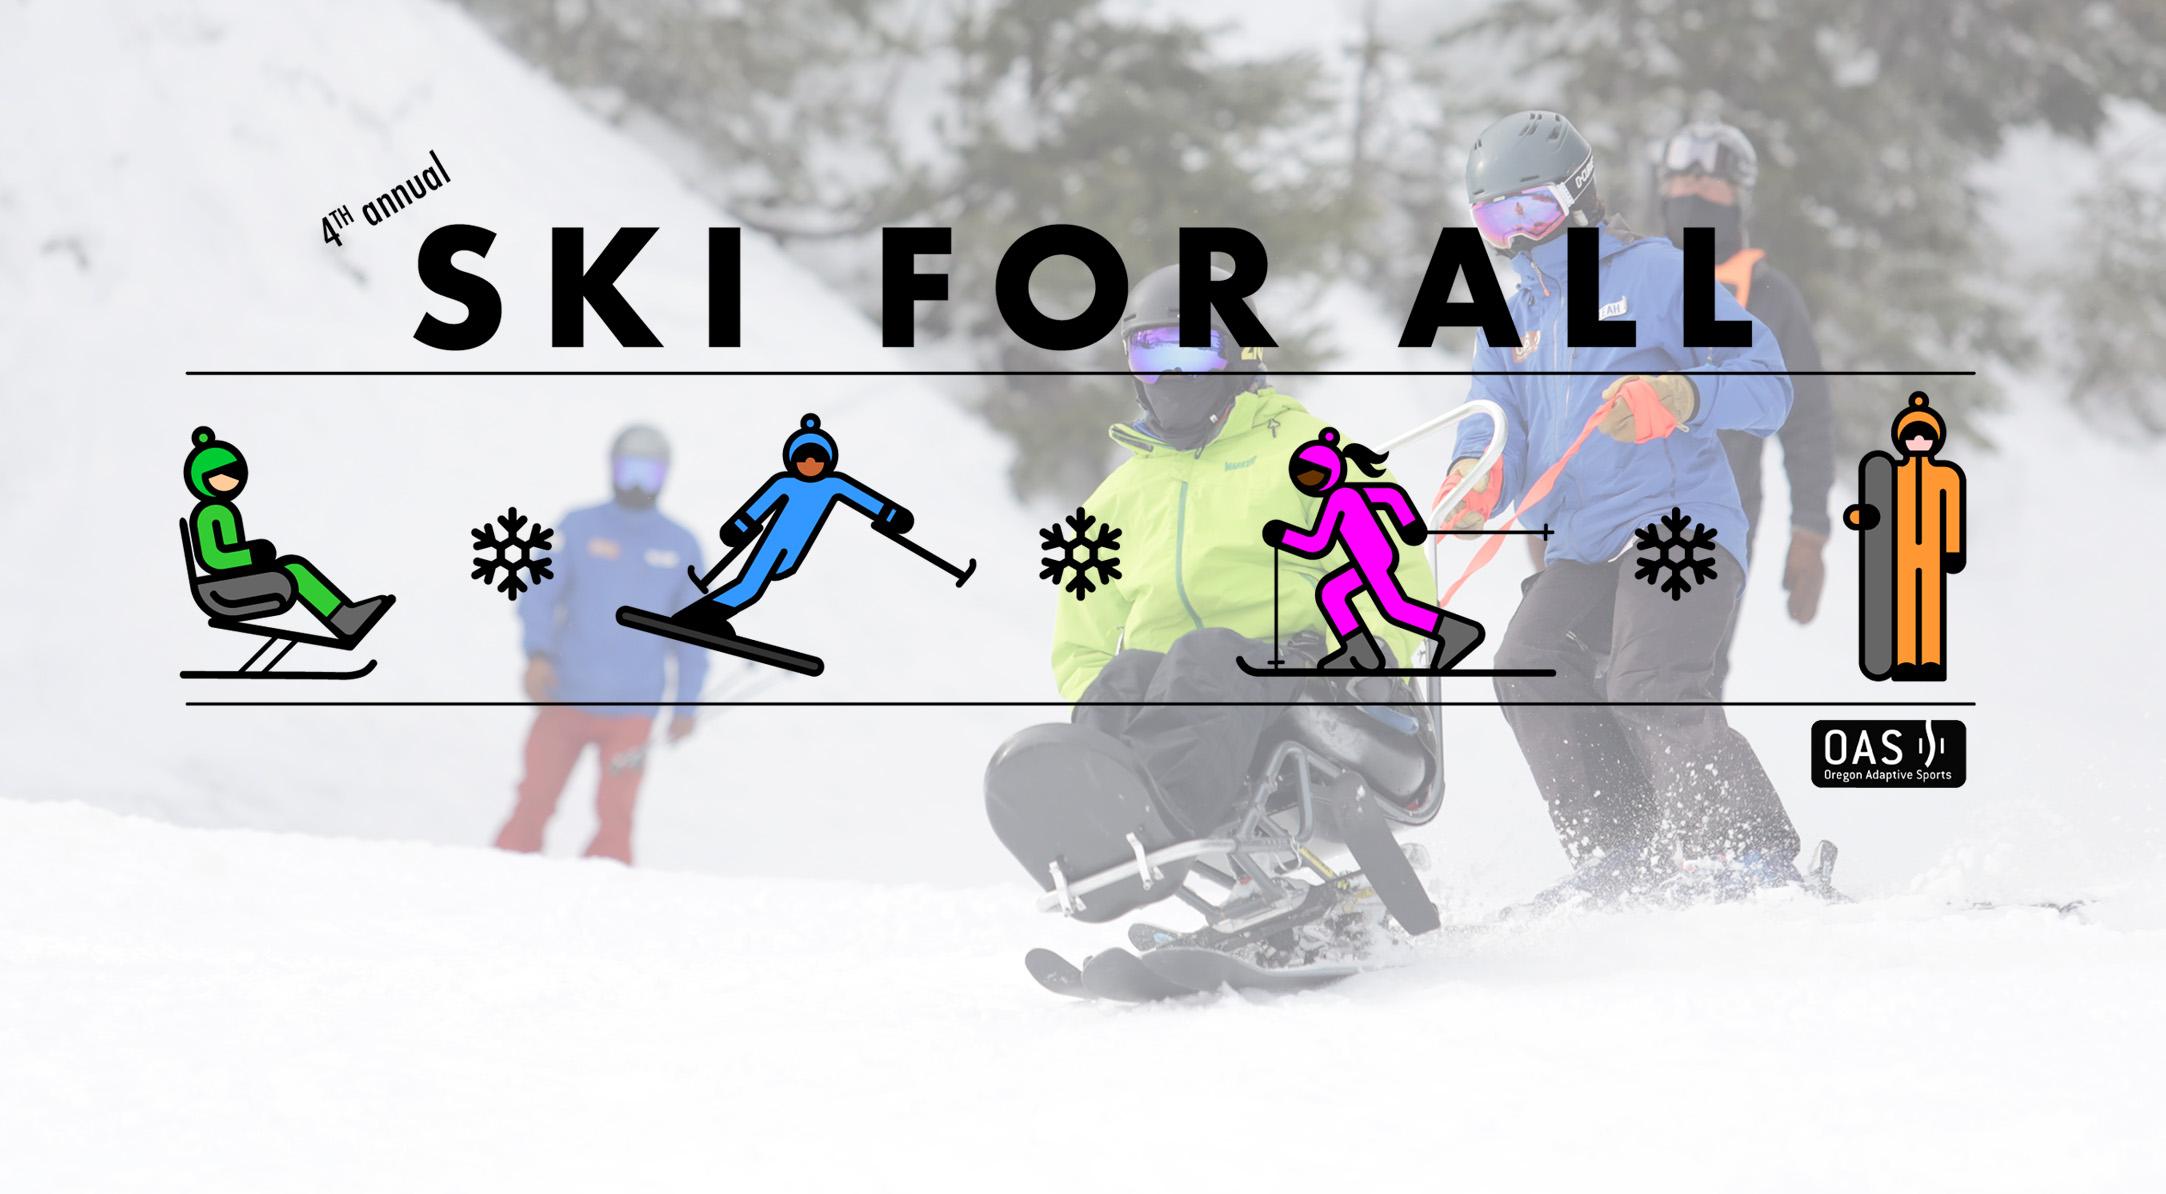 banner for 4th annual ski for all, has event logos, sponsor logos